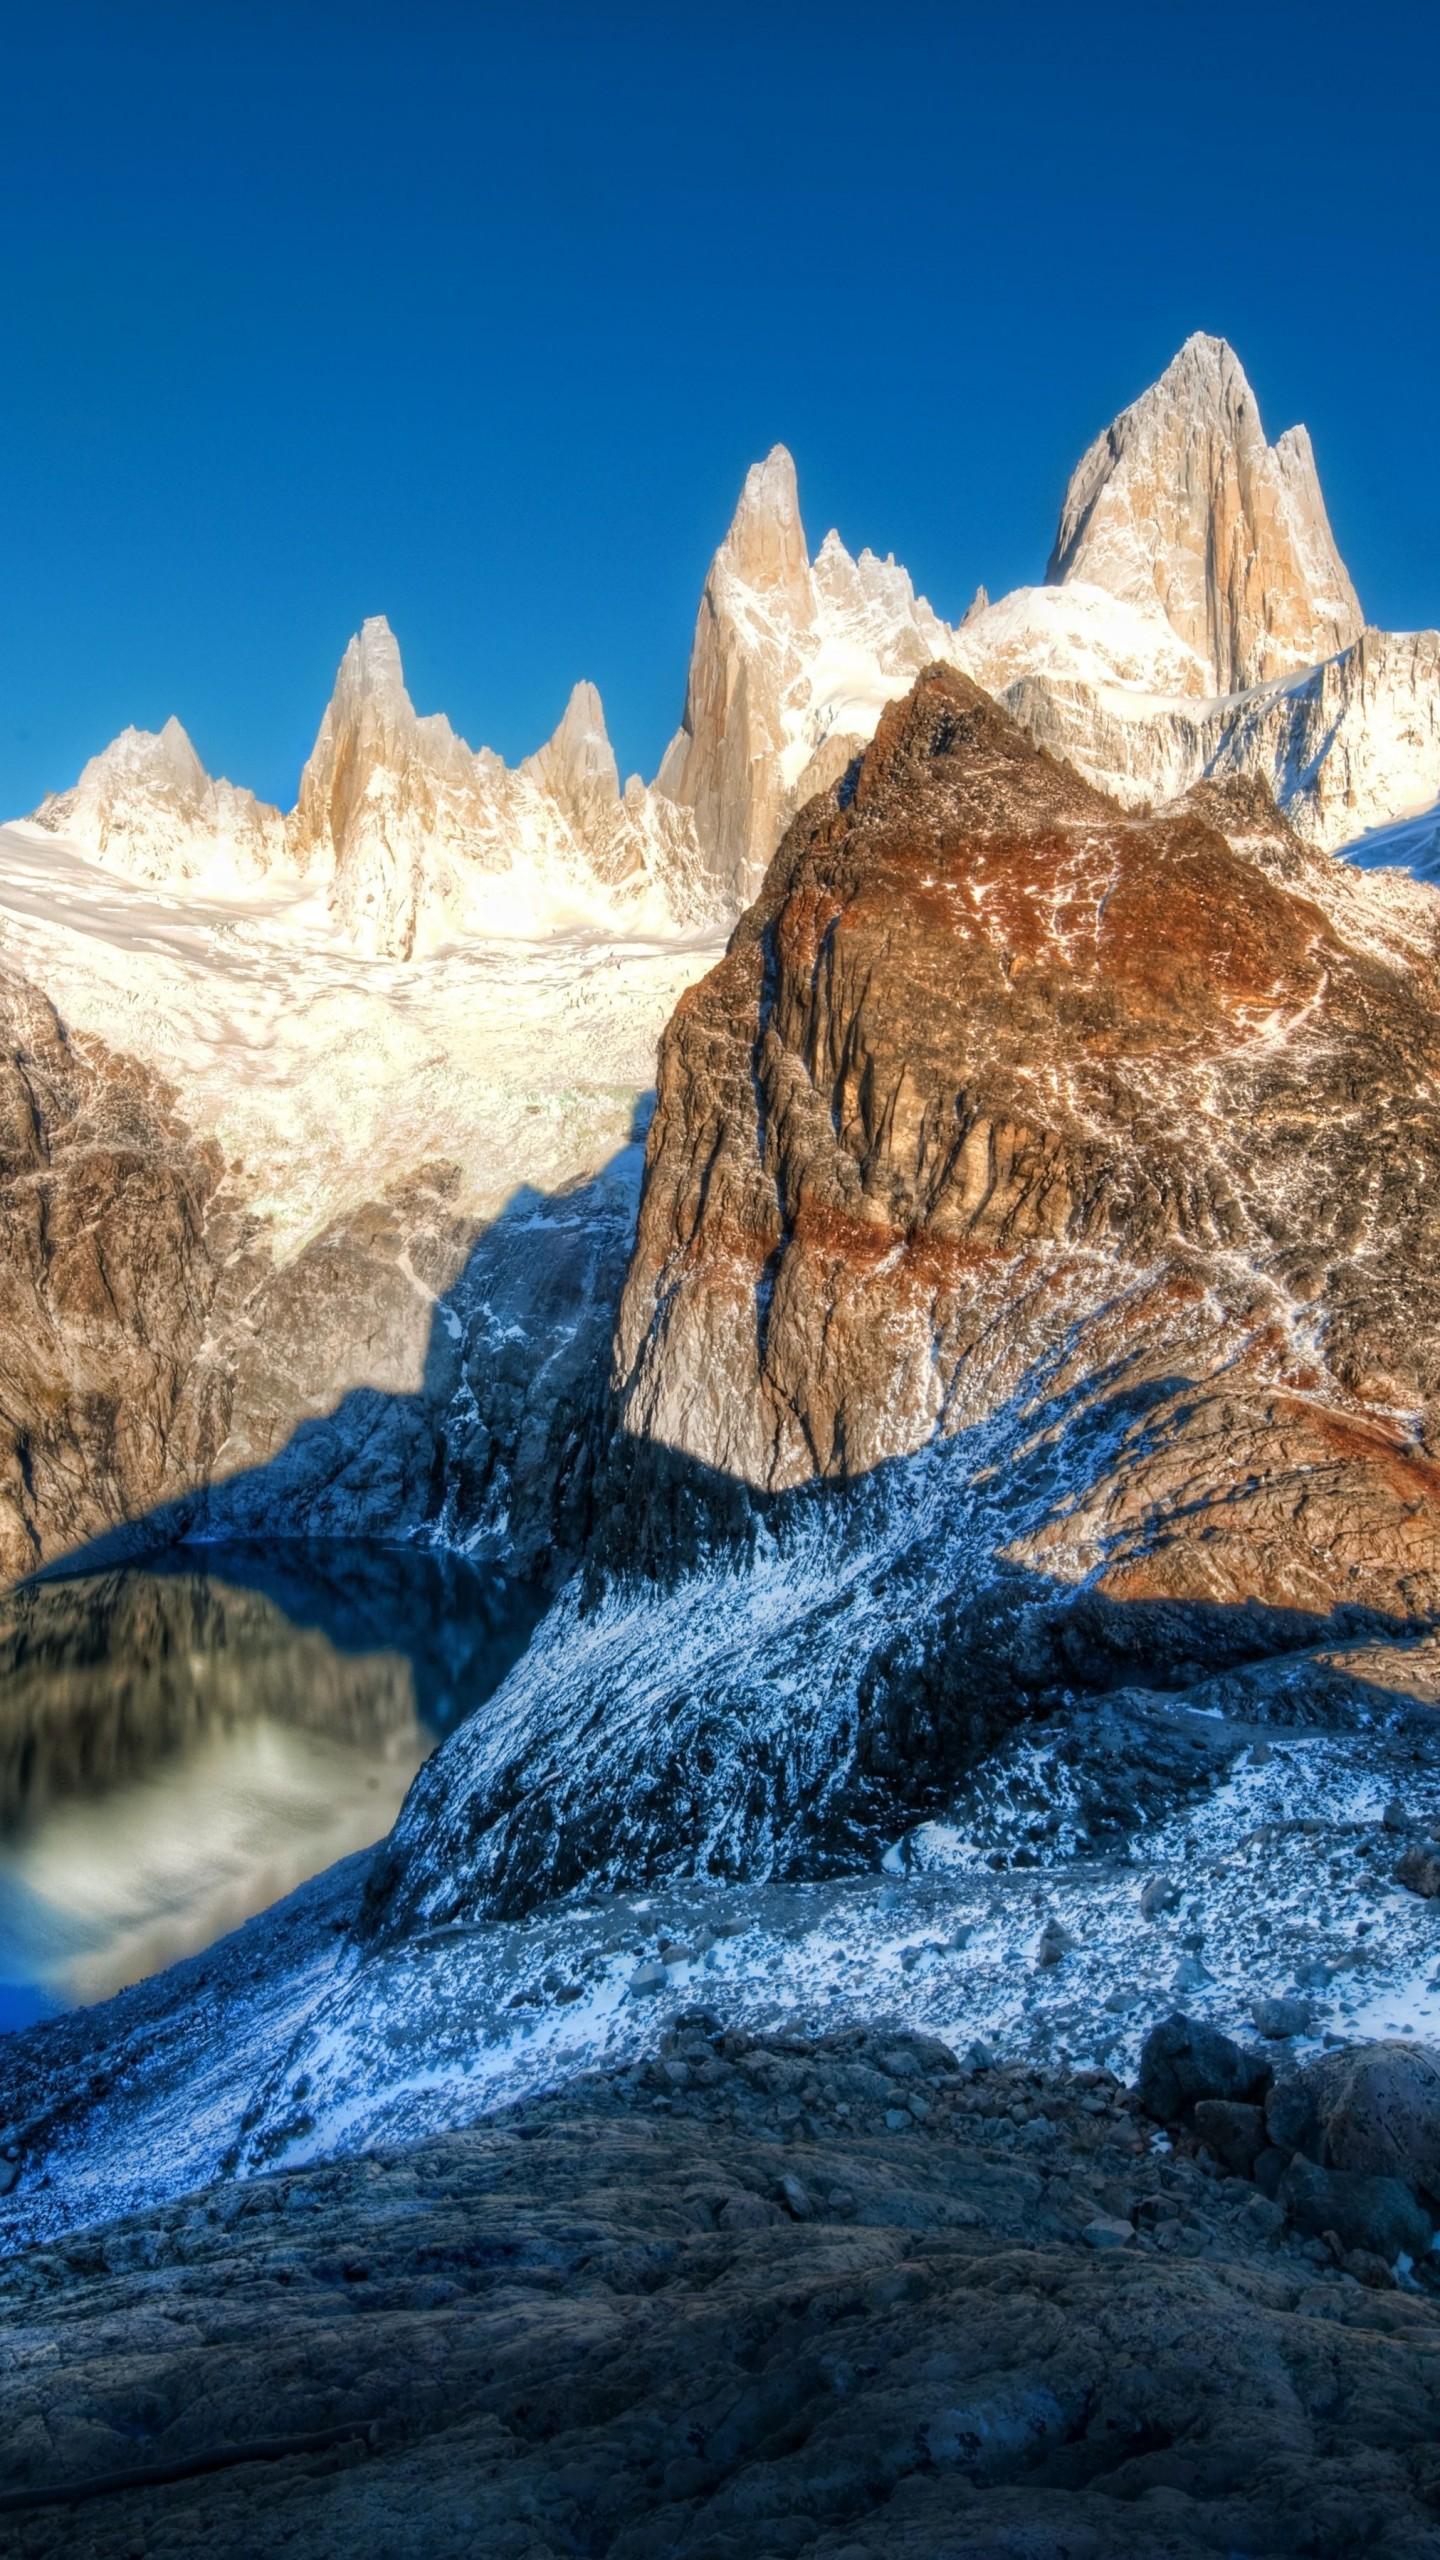 Wallpaper Andes  4k  5k Wallpaper  Argentina  Mountain  Lake  Travel  Tourism  Nature  5178